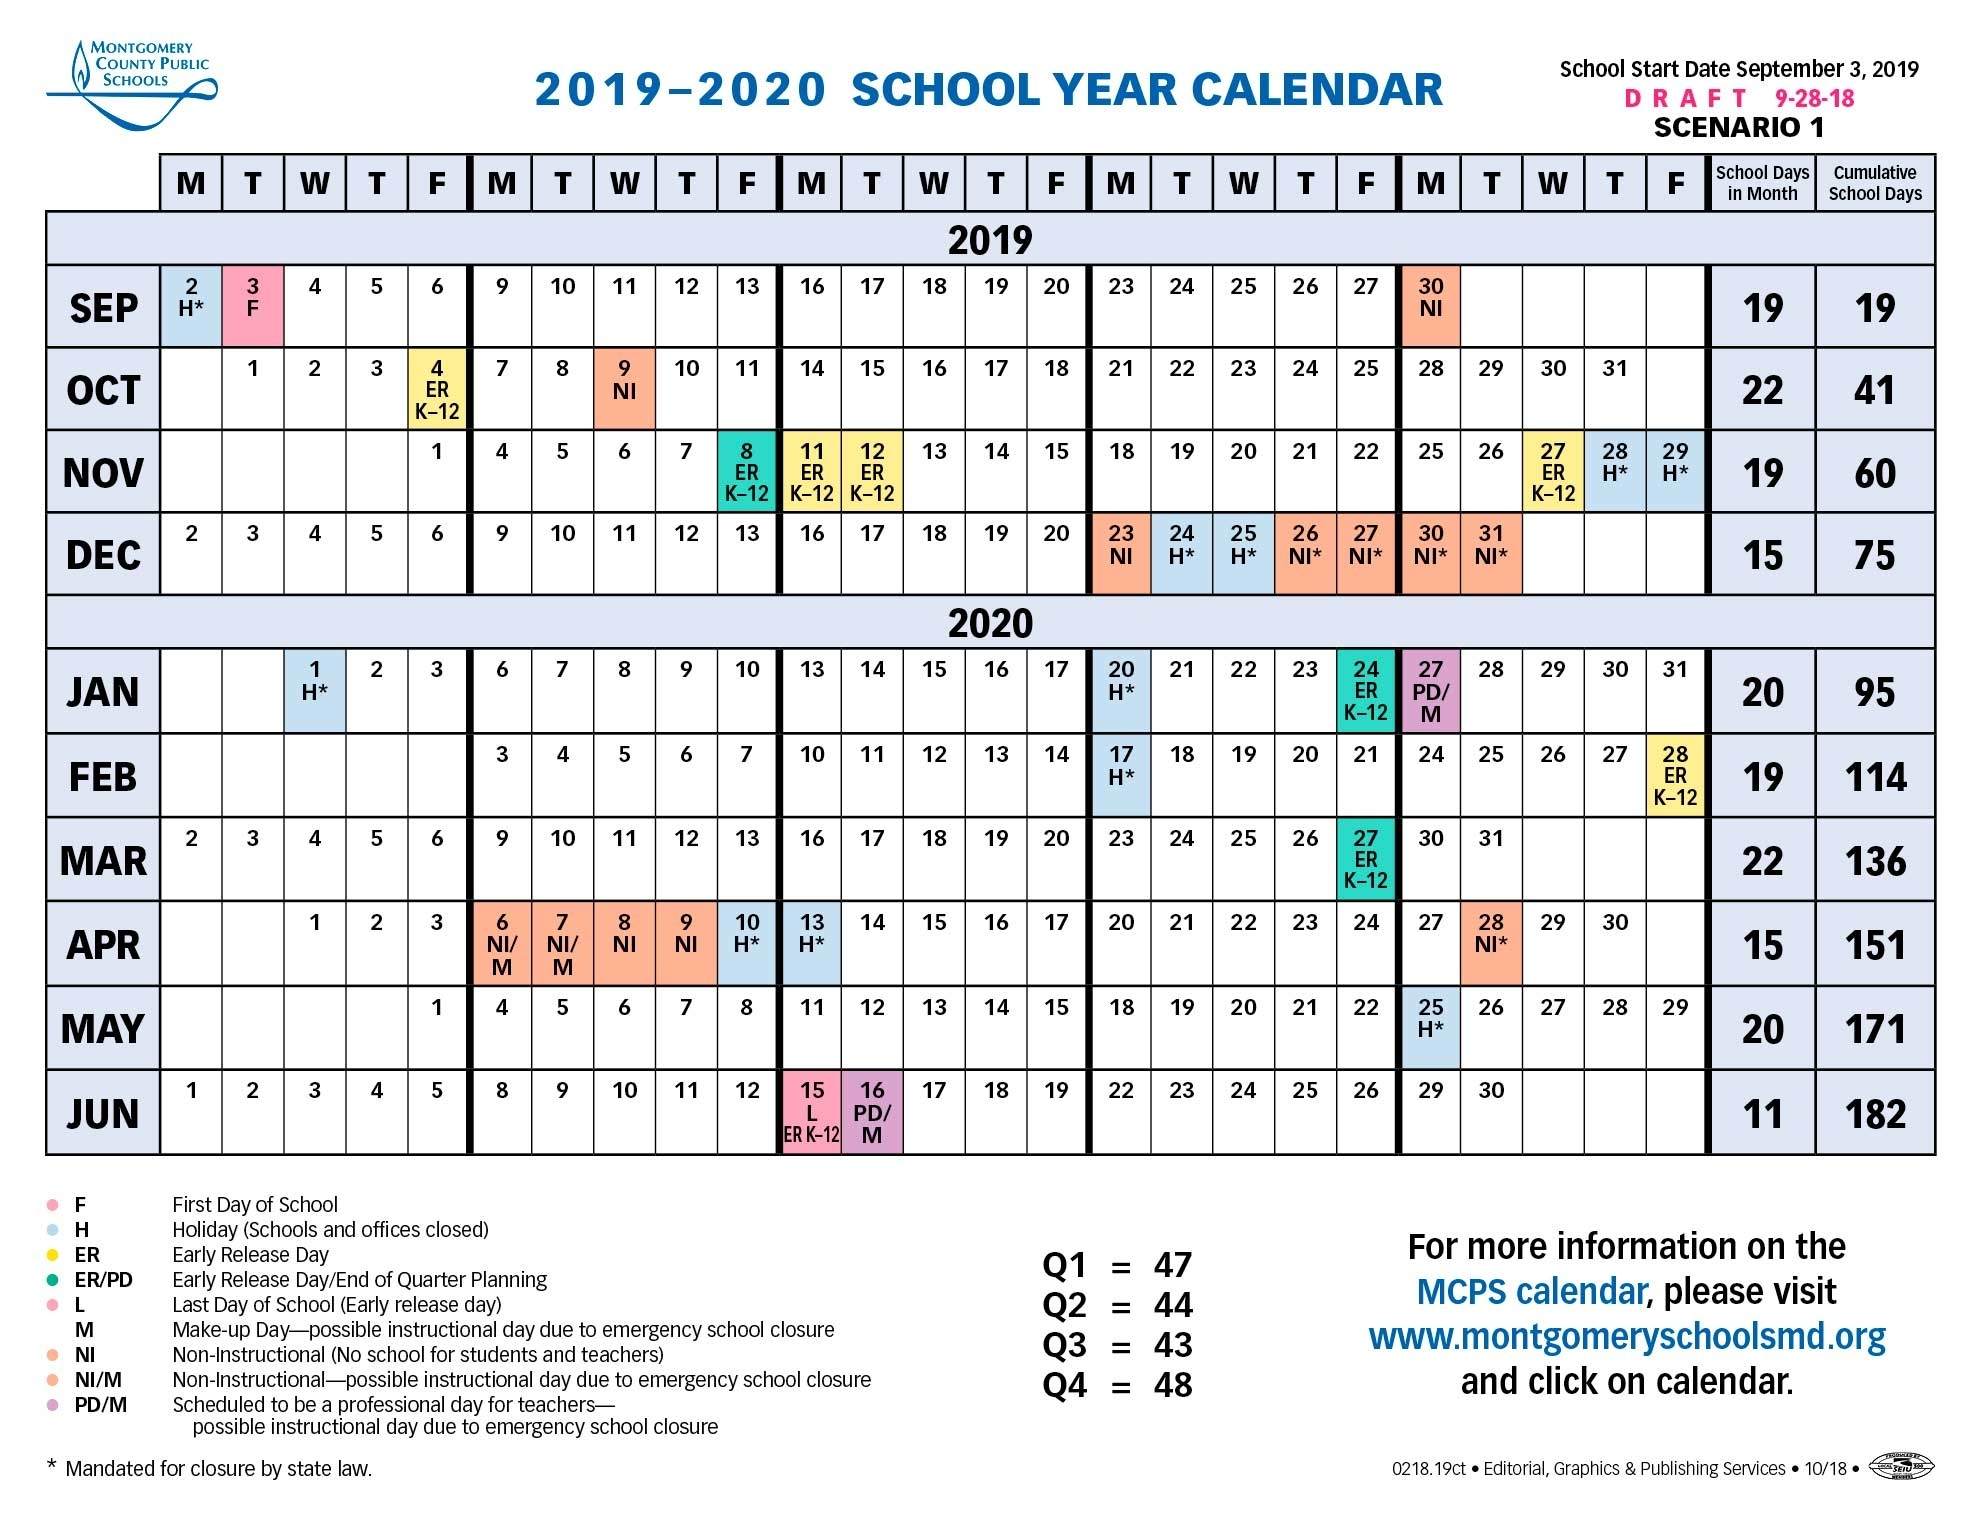 School Board Approves Longer Spring Break For 2019-2020